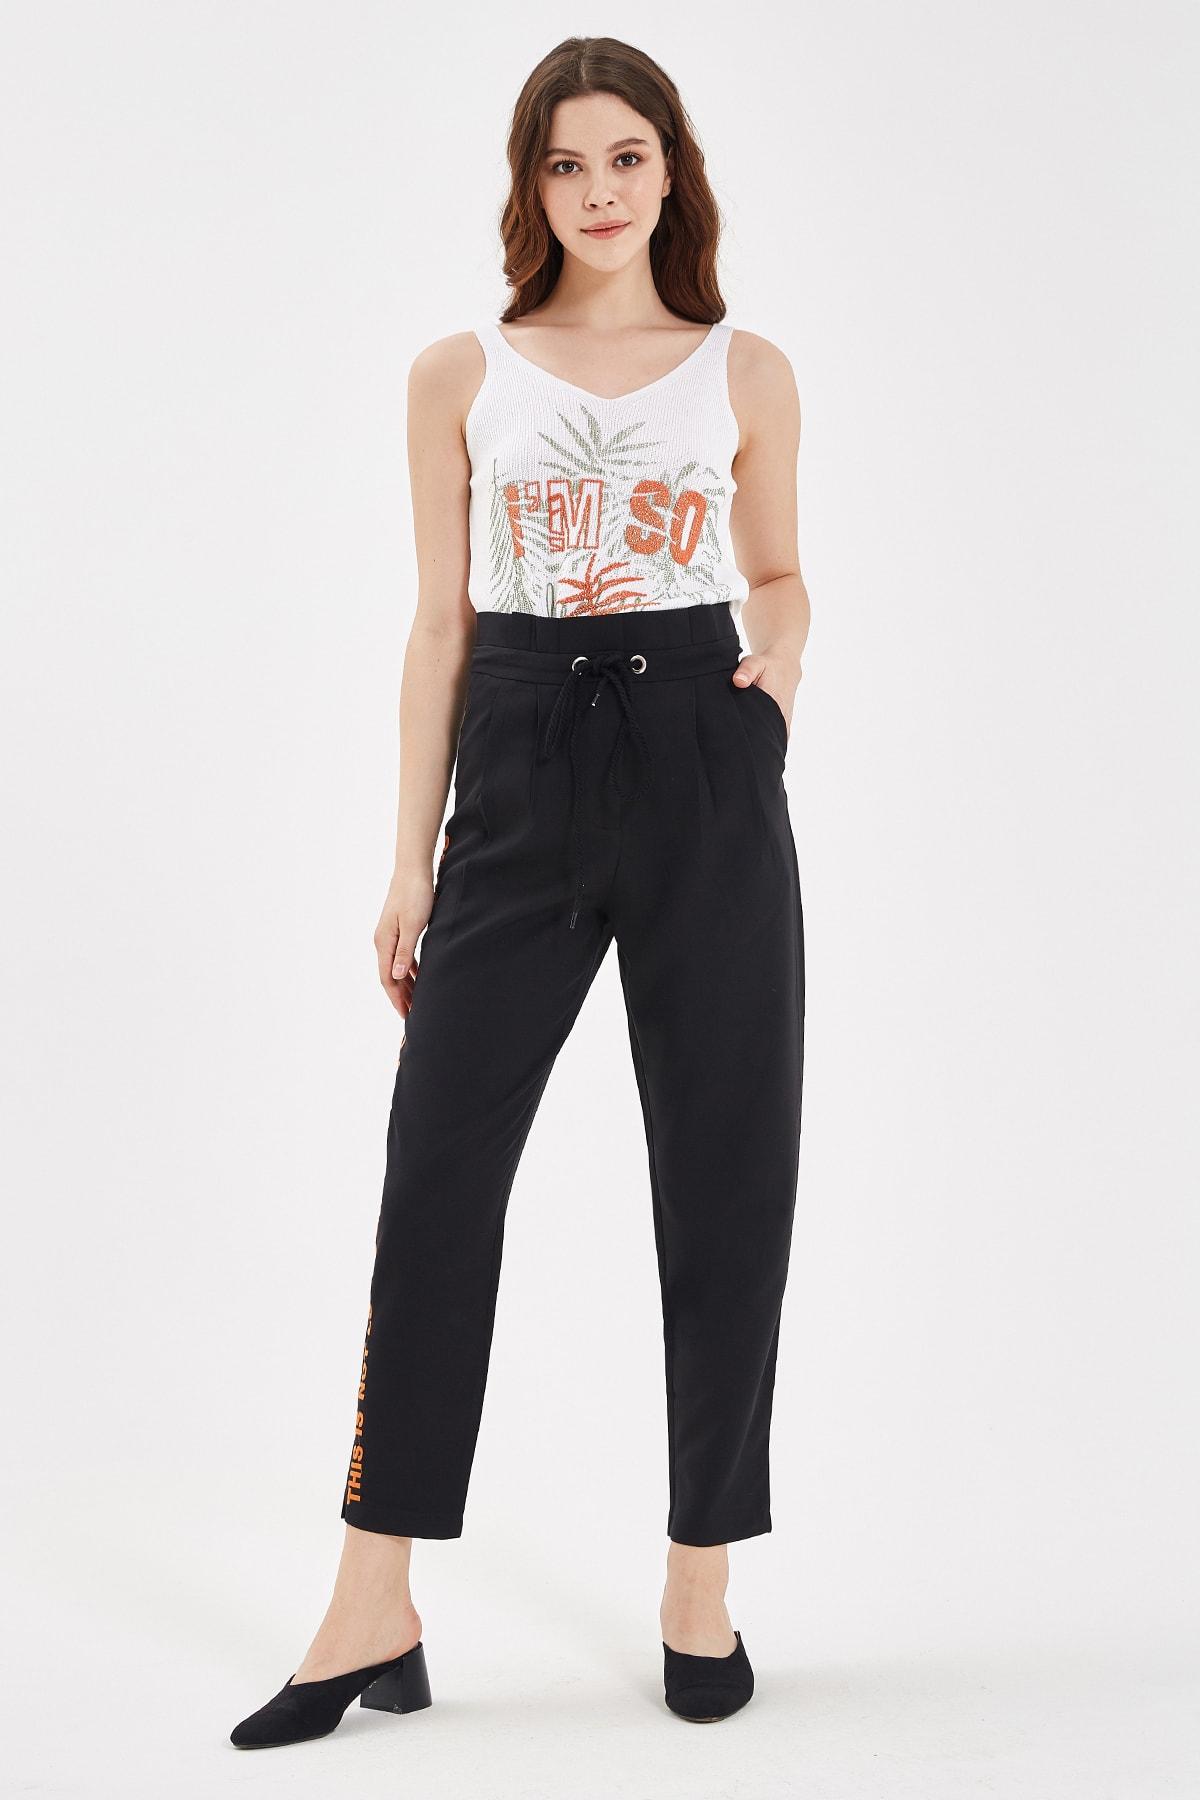 Nisan Triko Siyah Sağlama Detaylı Pantolon 1